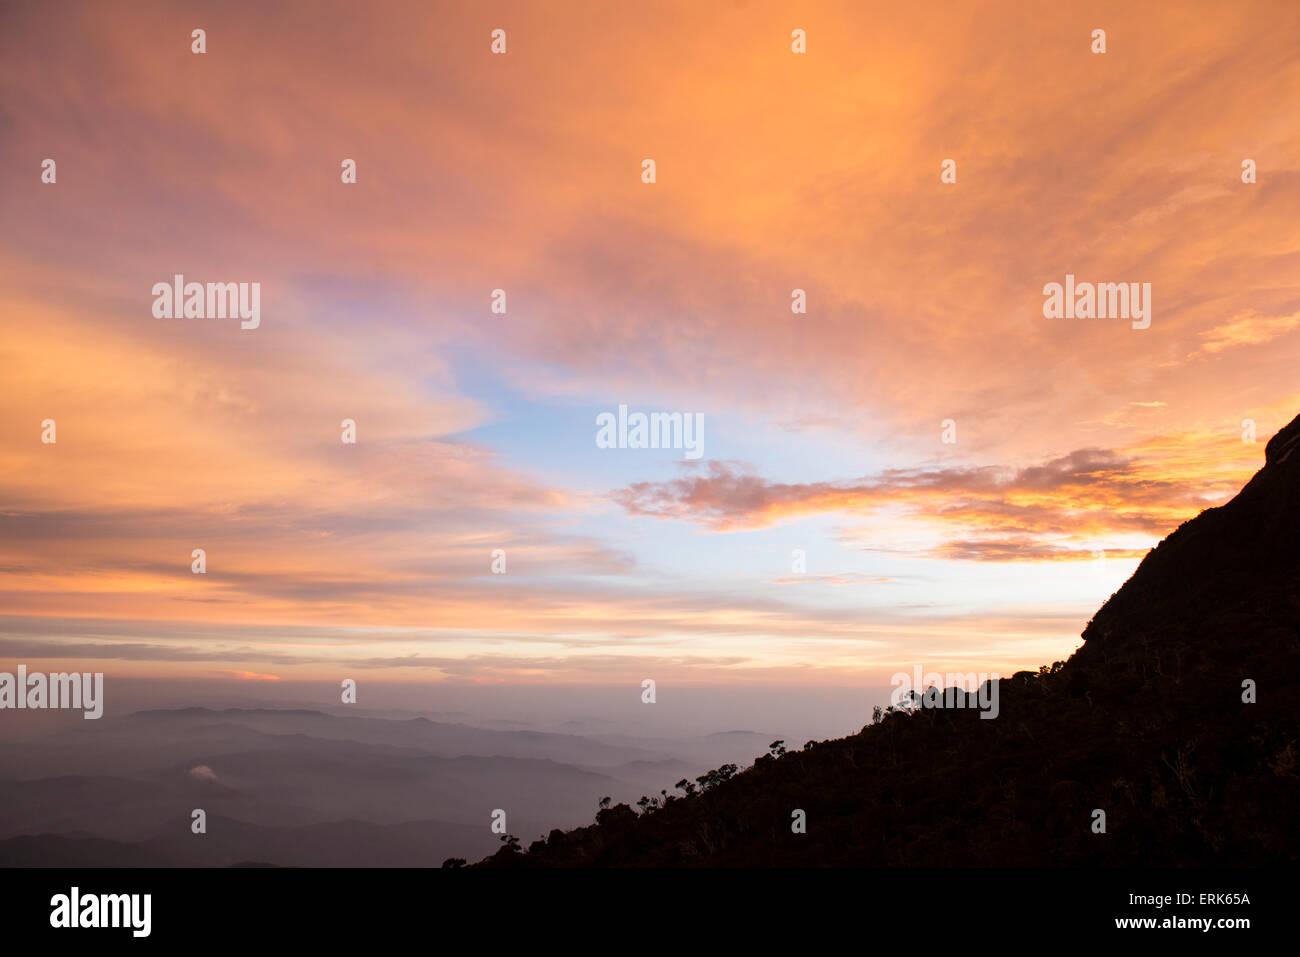 Sunset, Mount Kinabalu, Sabah, Borneo, Malaysia - Stock Image